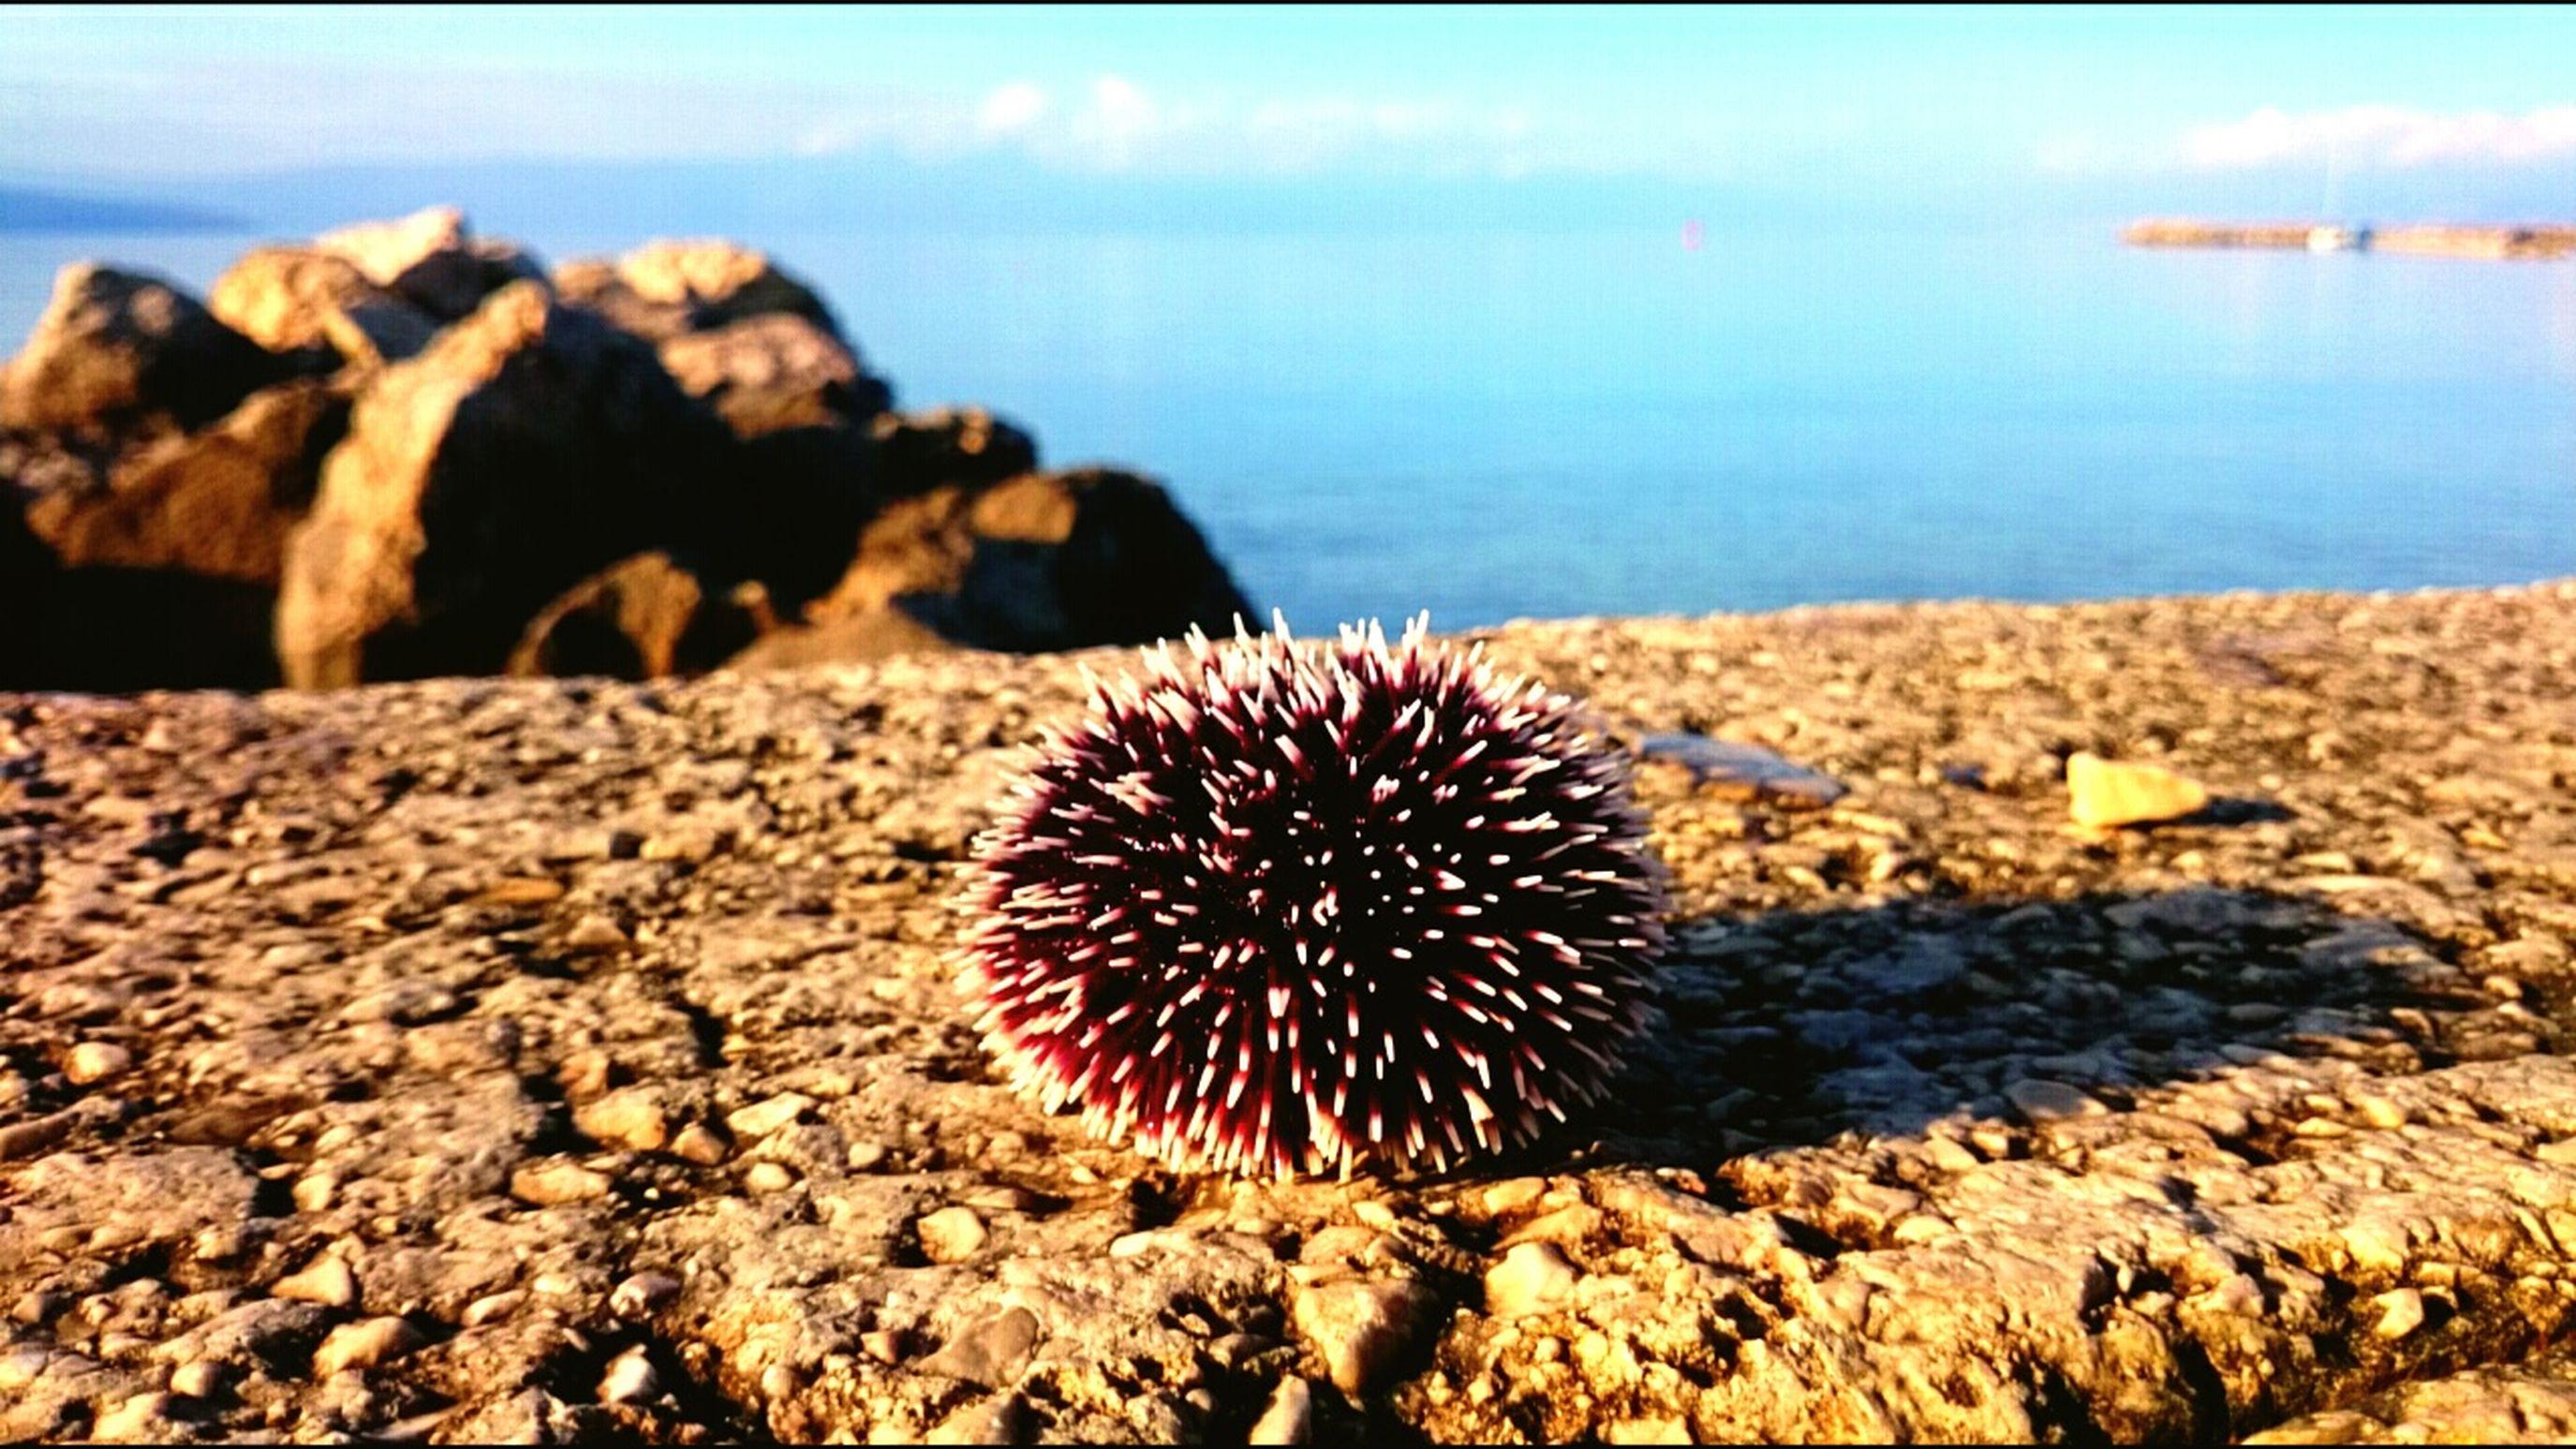 Sea-urchin Croatia Nature Island Krk